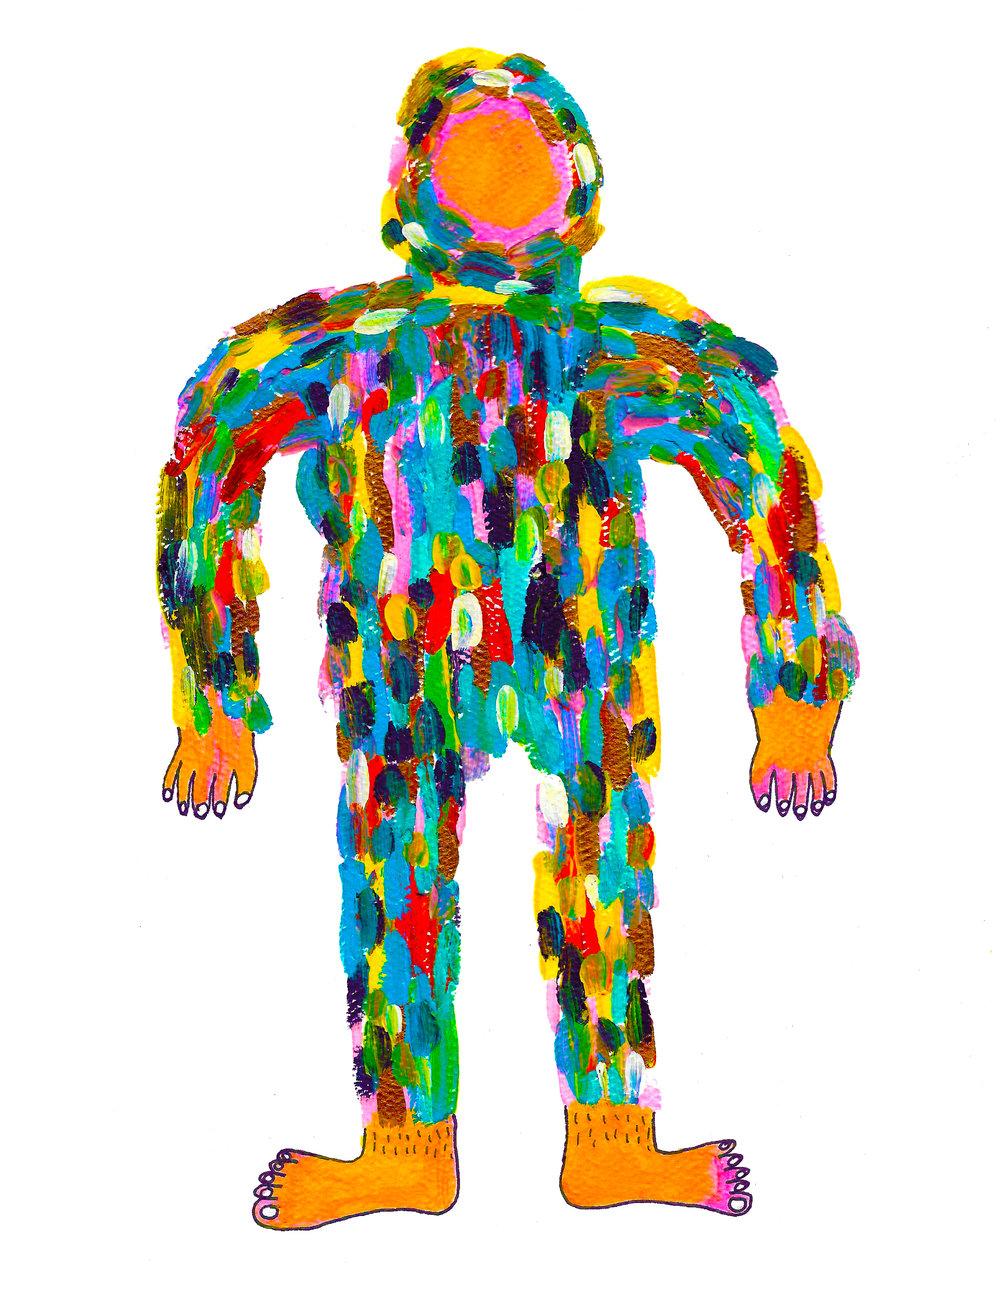 Rainbow suit guy.jpg